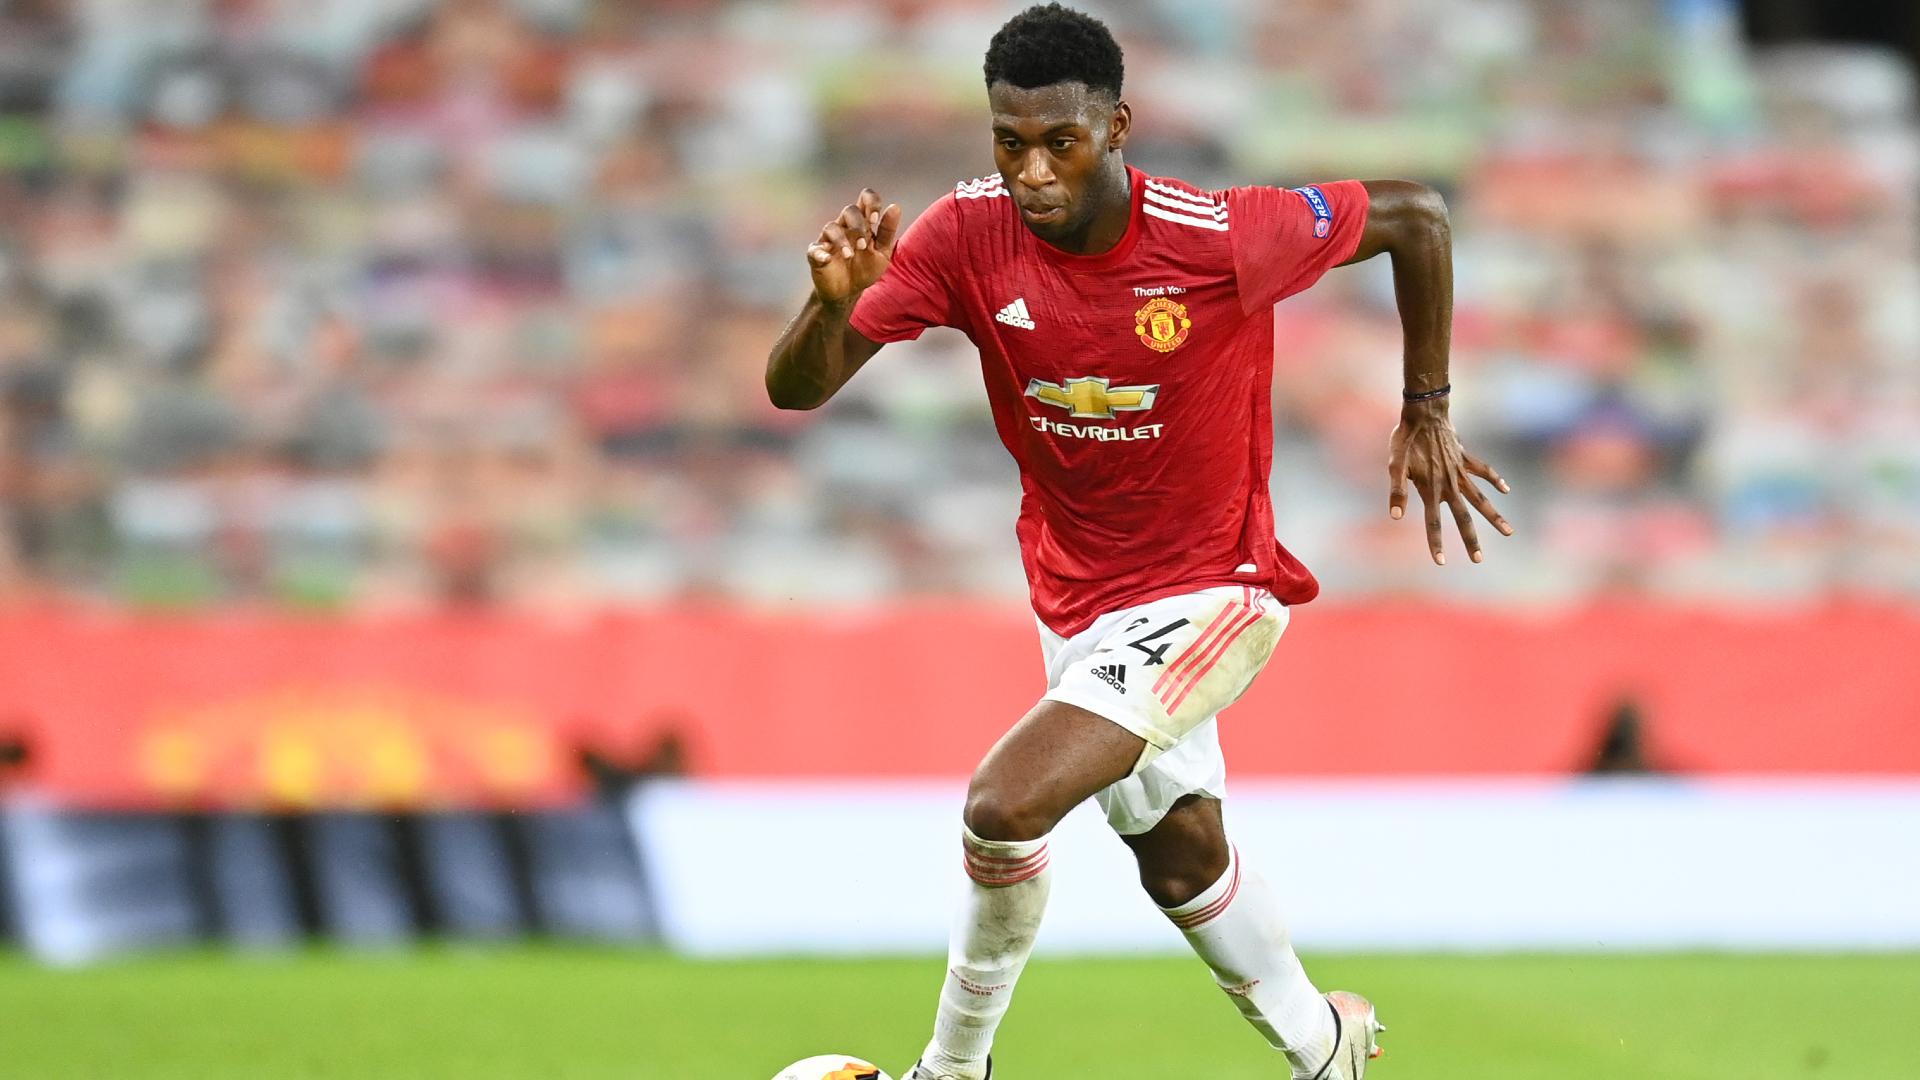 Solskjaer confirms Fosu-Mensah set for Man Utd exit